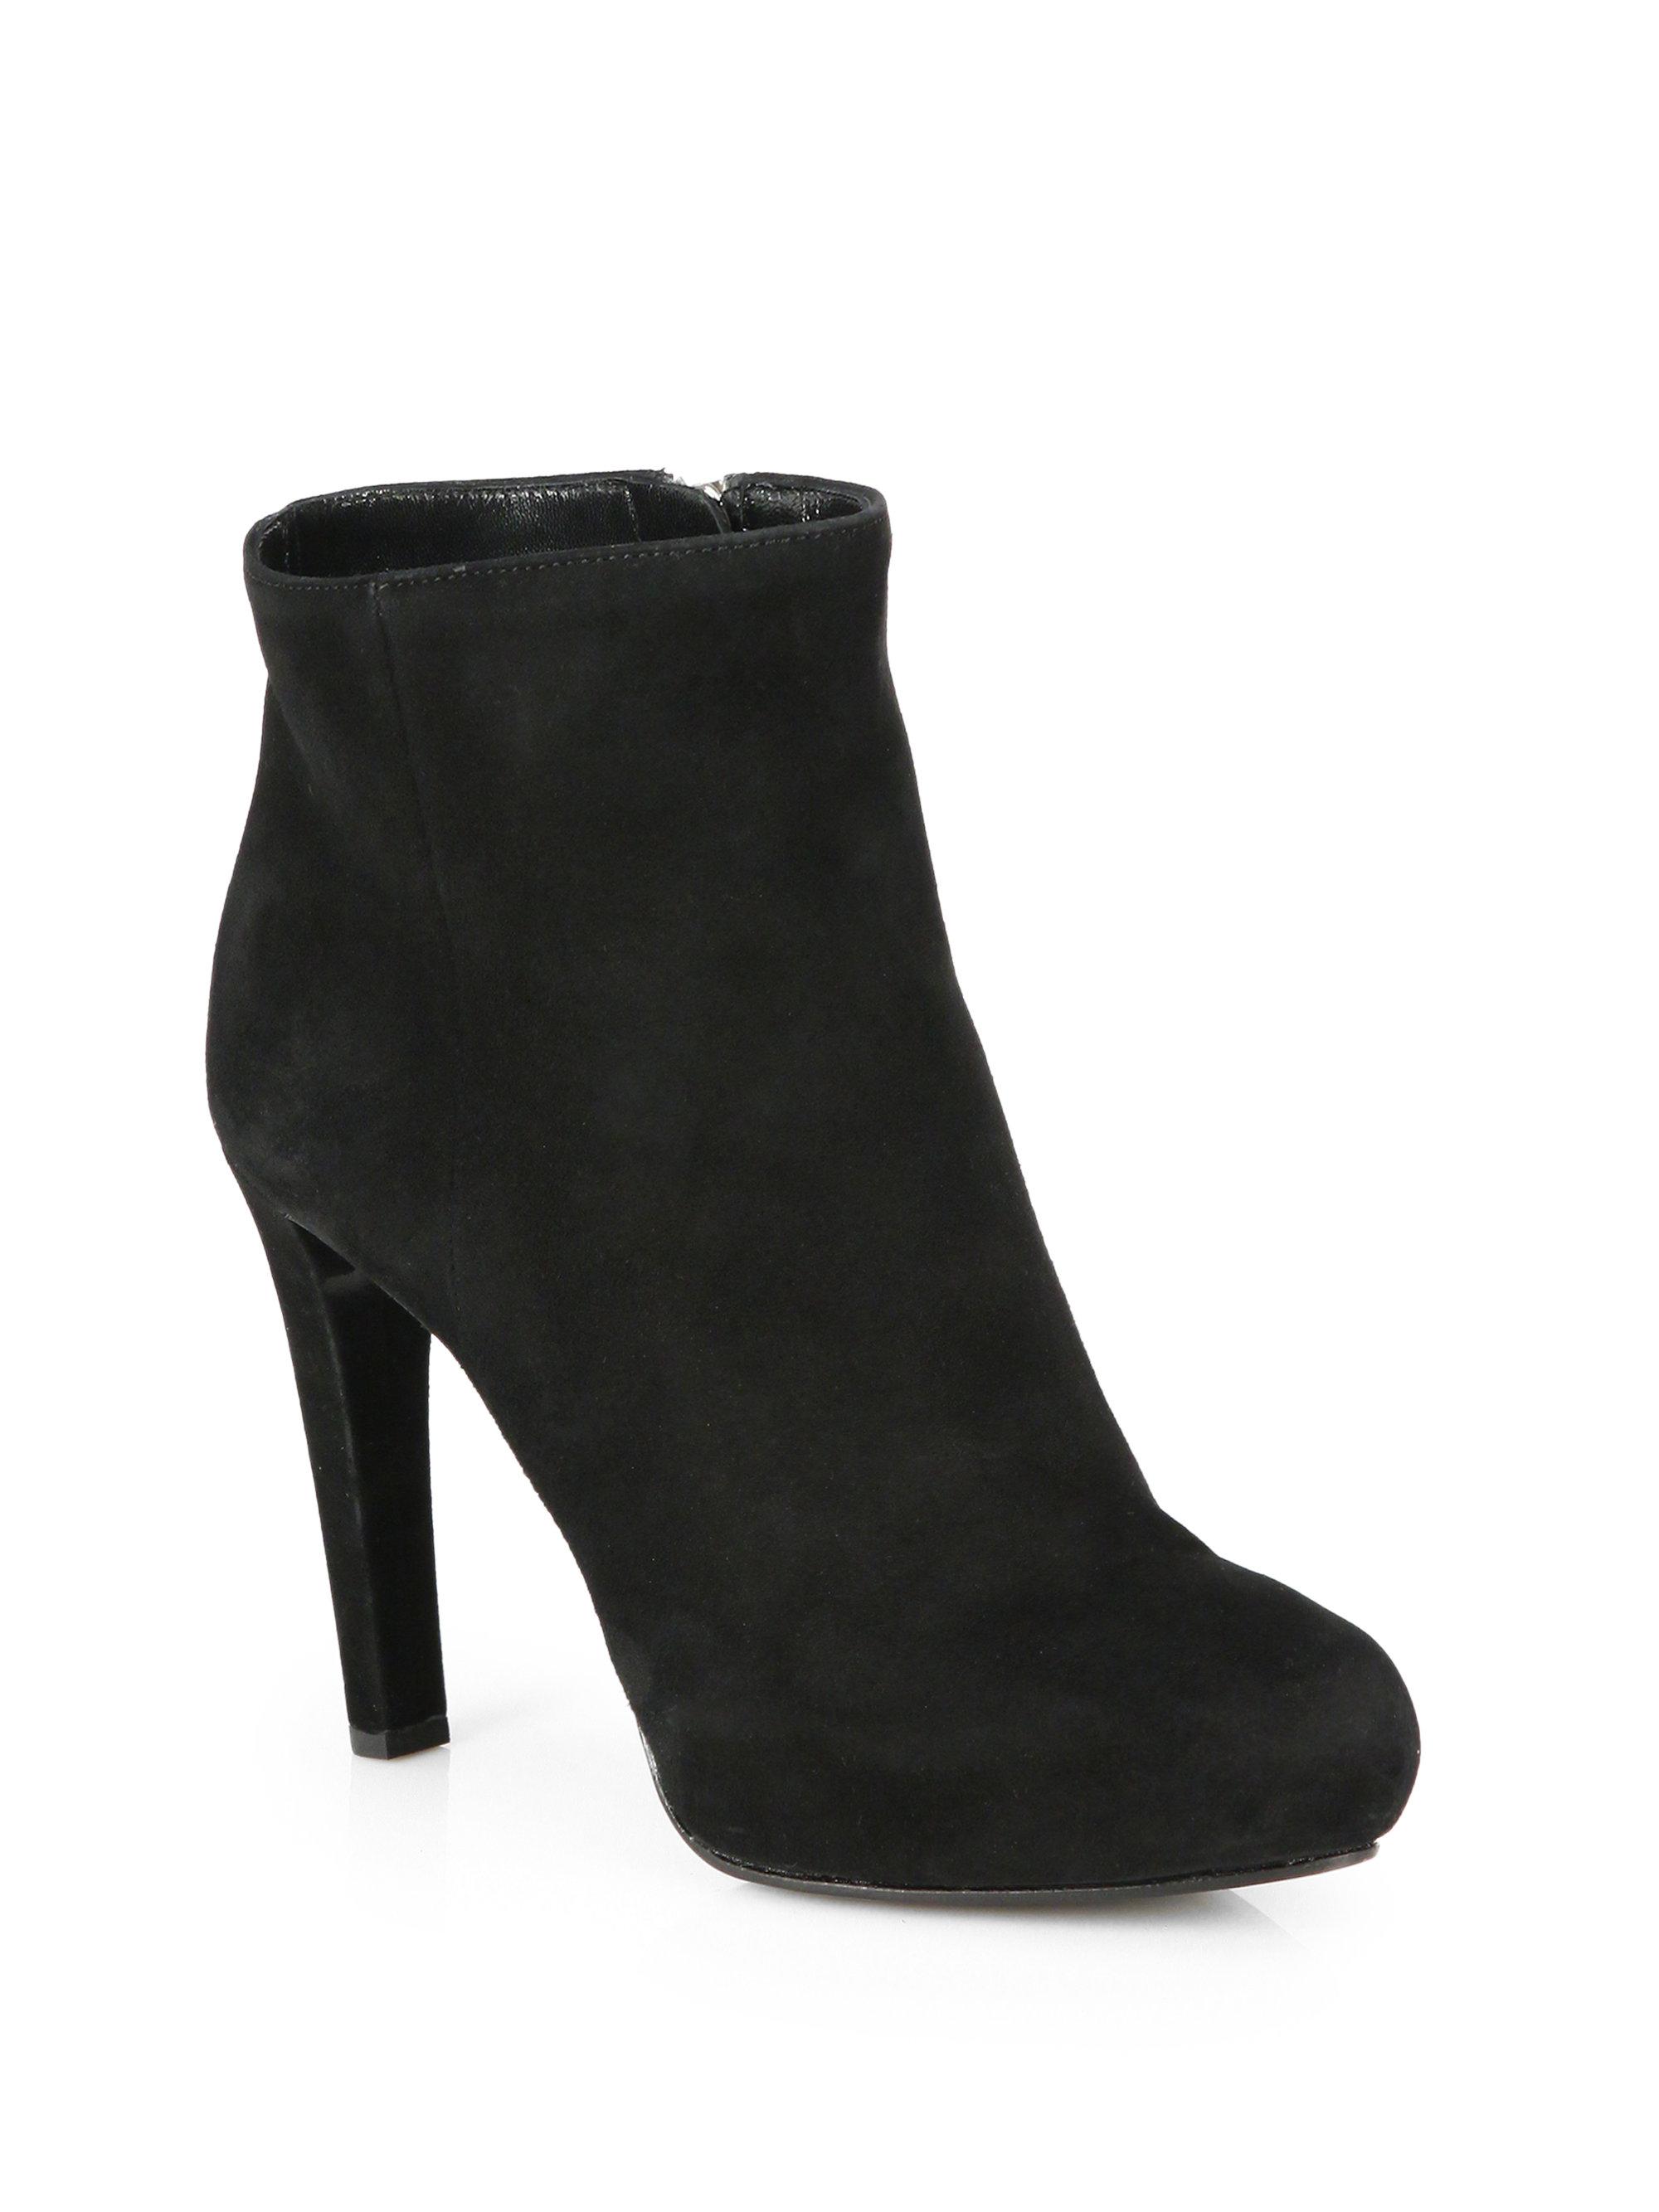 prada suede platform ankle boots in black nero black lyst